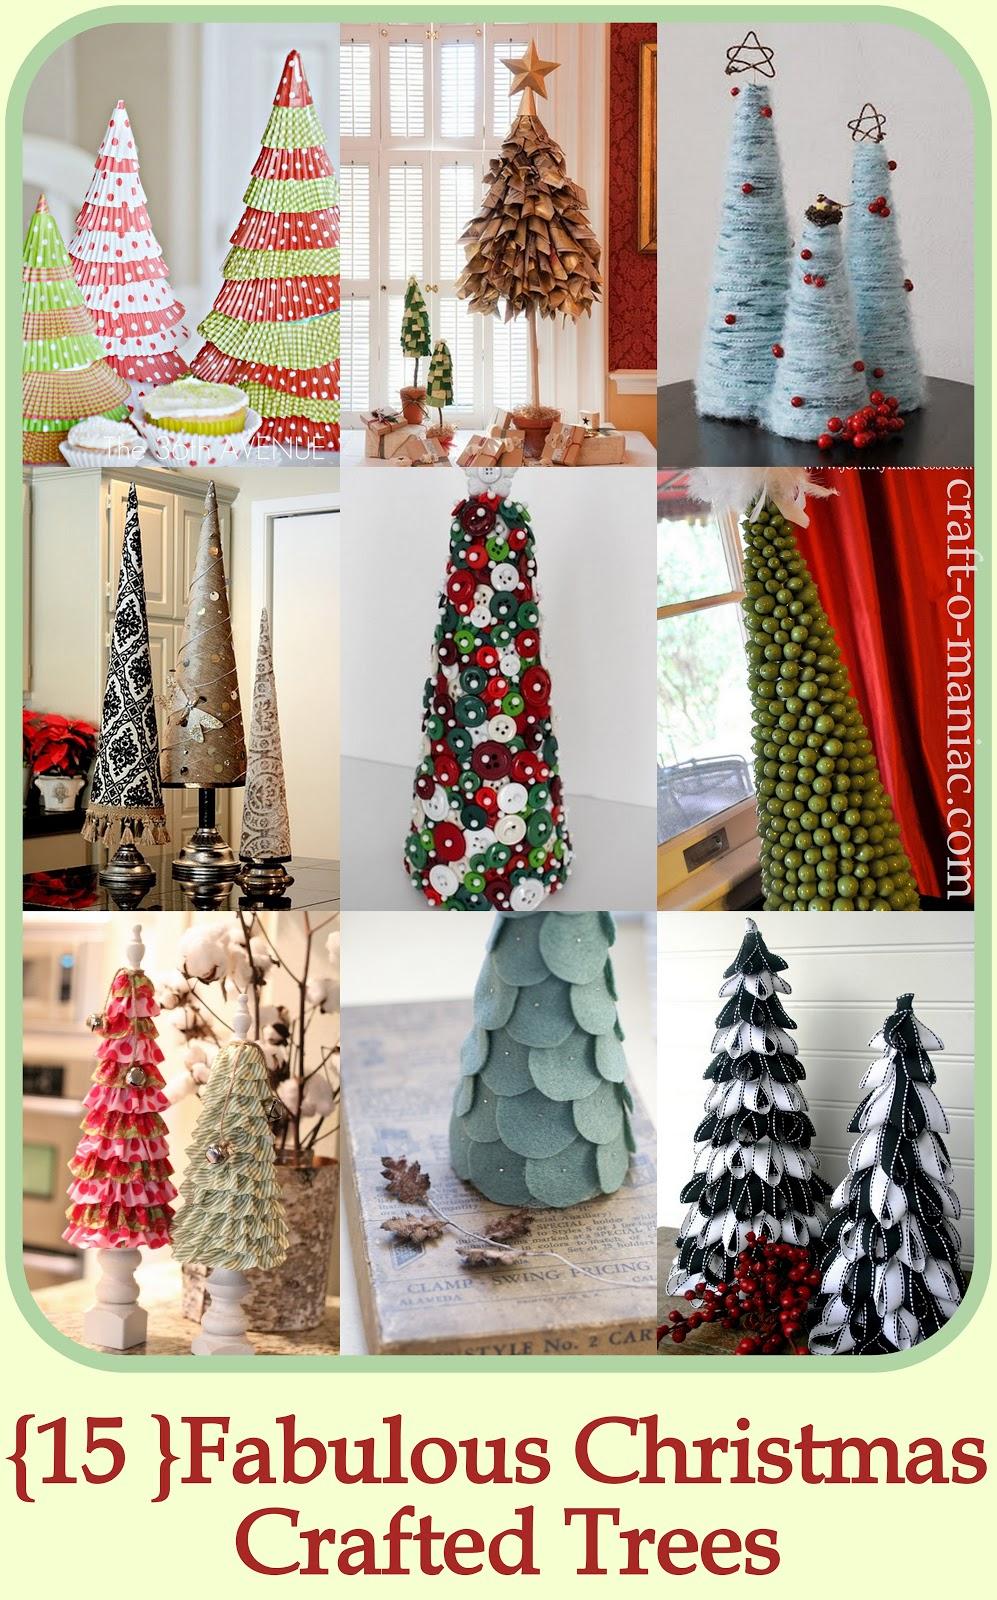 15 Fabulous Christmas Crafted Trees Craft O Maniac